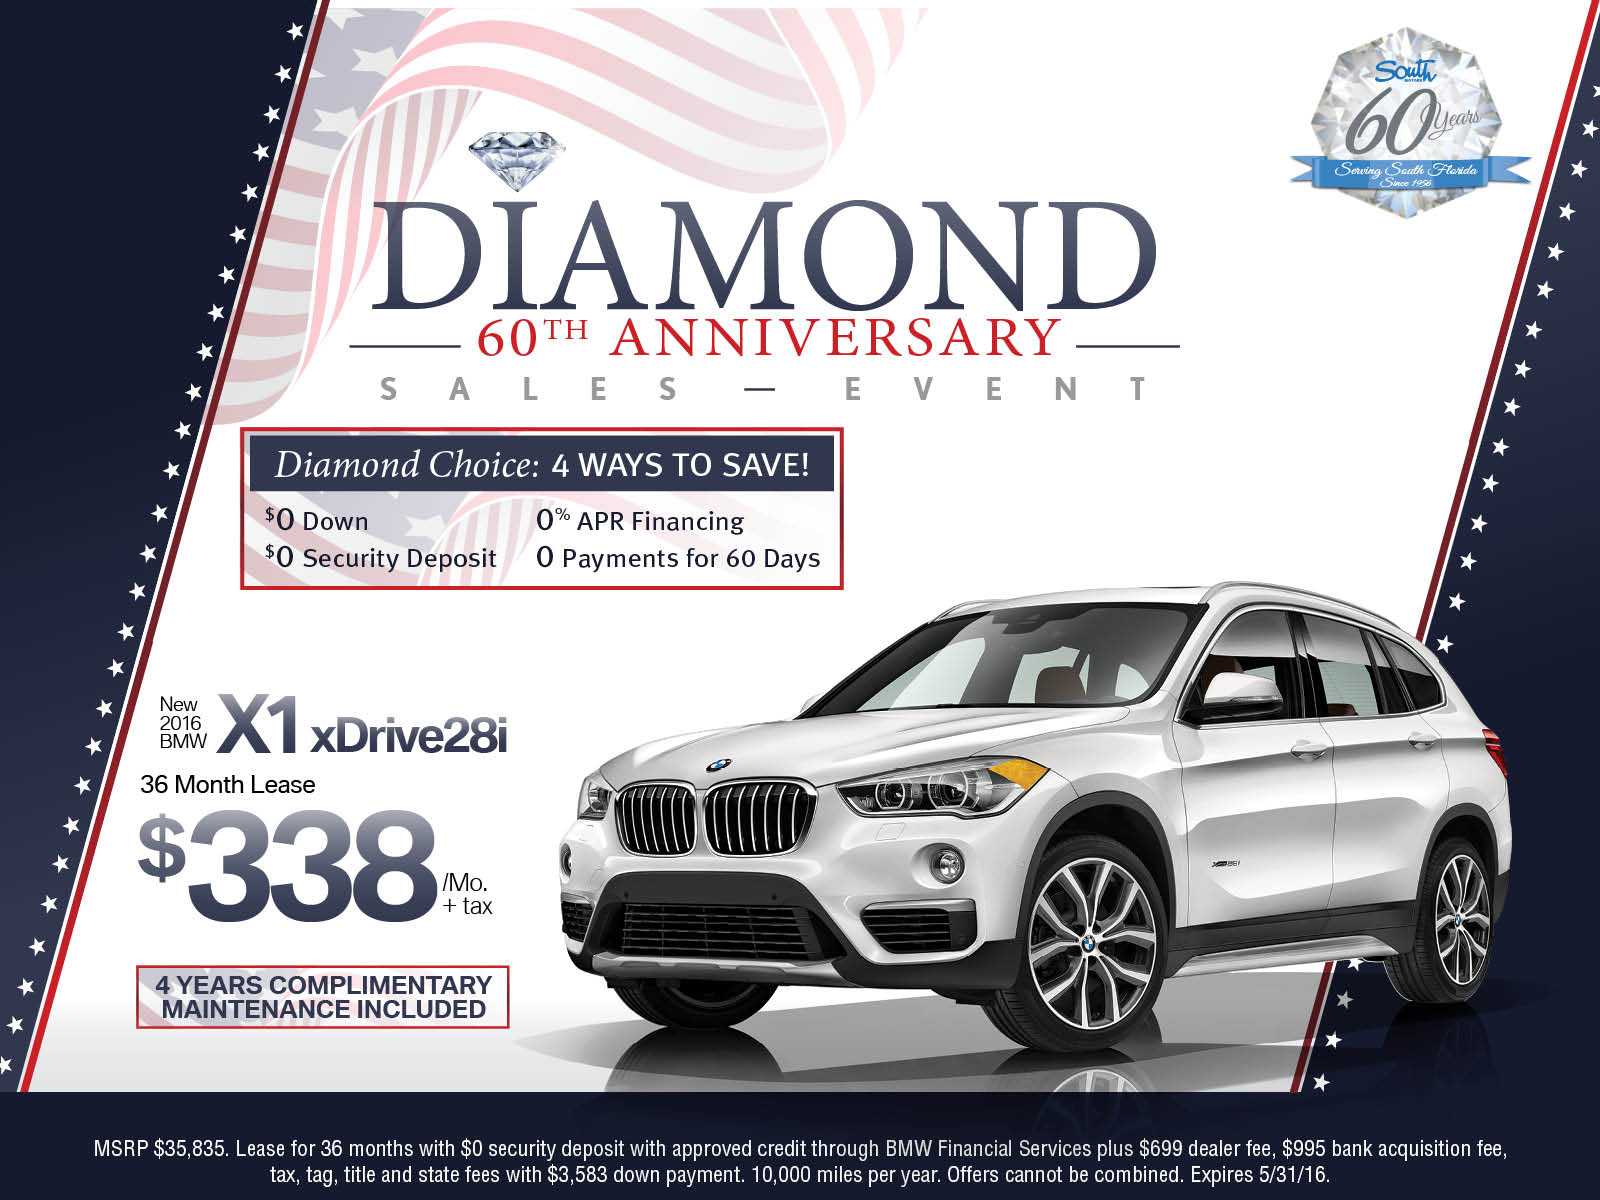 BMW X1 lease offer